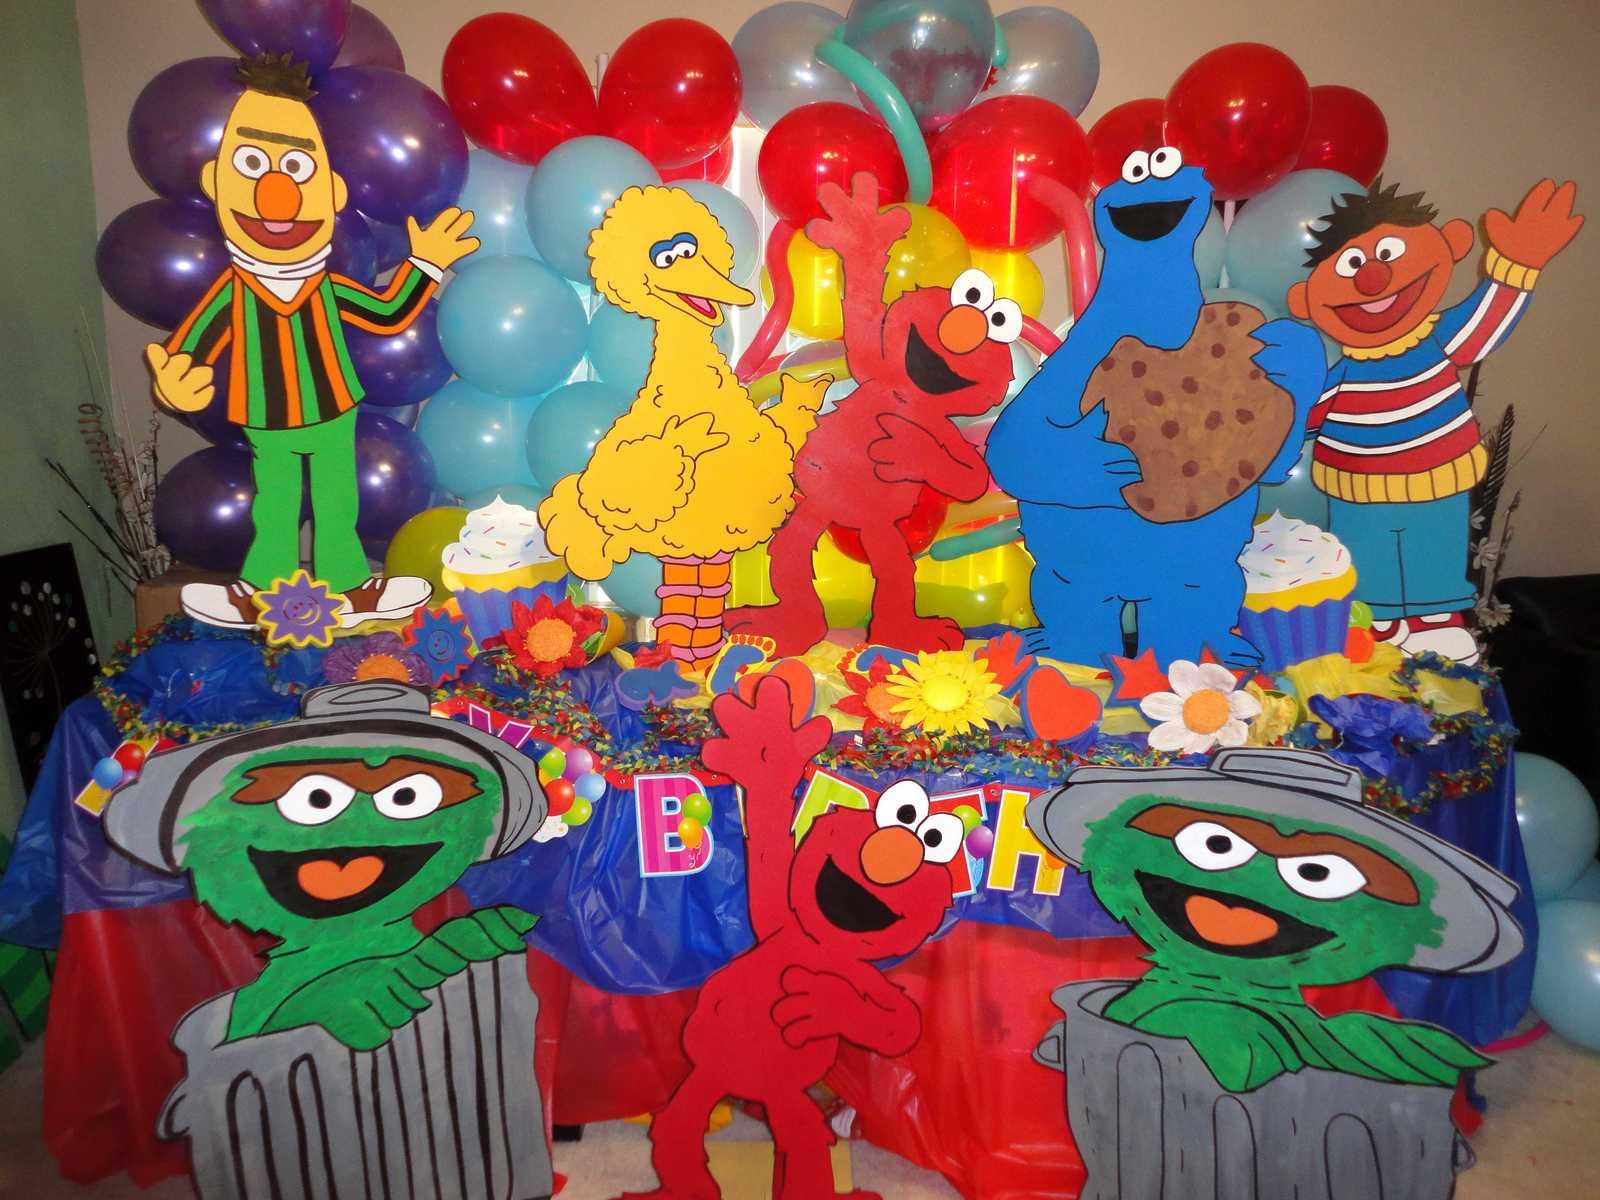 Vase Decoration Ideas 3 Feet Sesame Street Birthday Party And 27 Similar Items